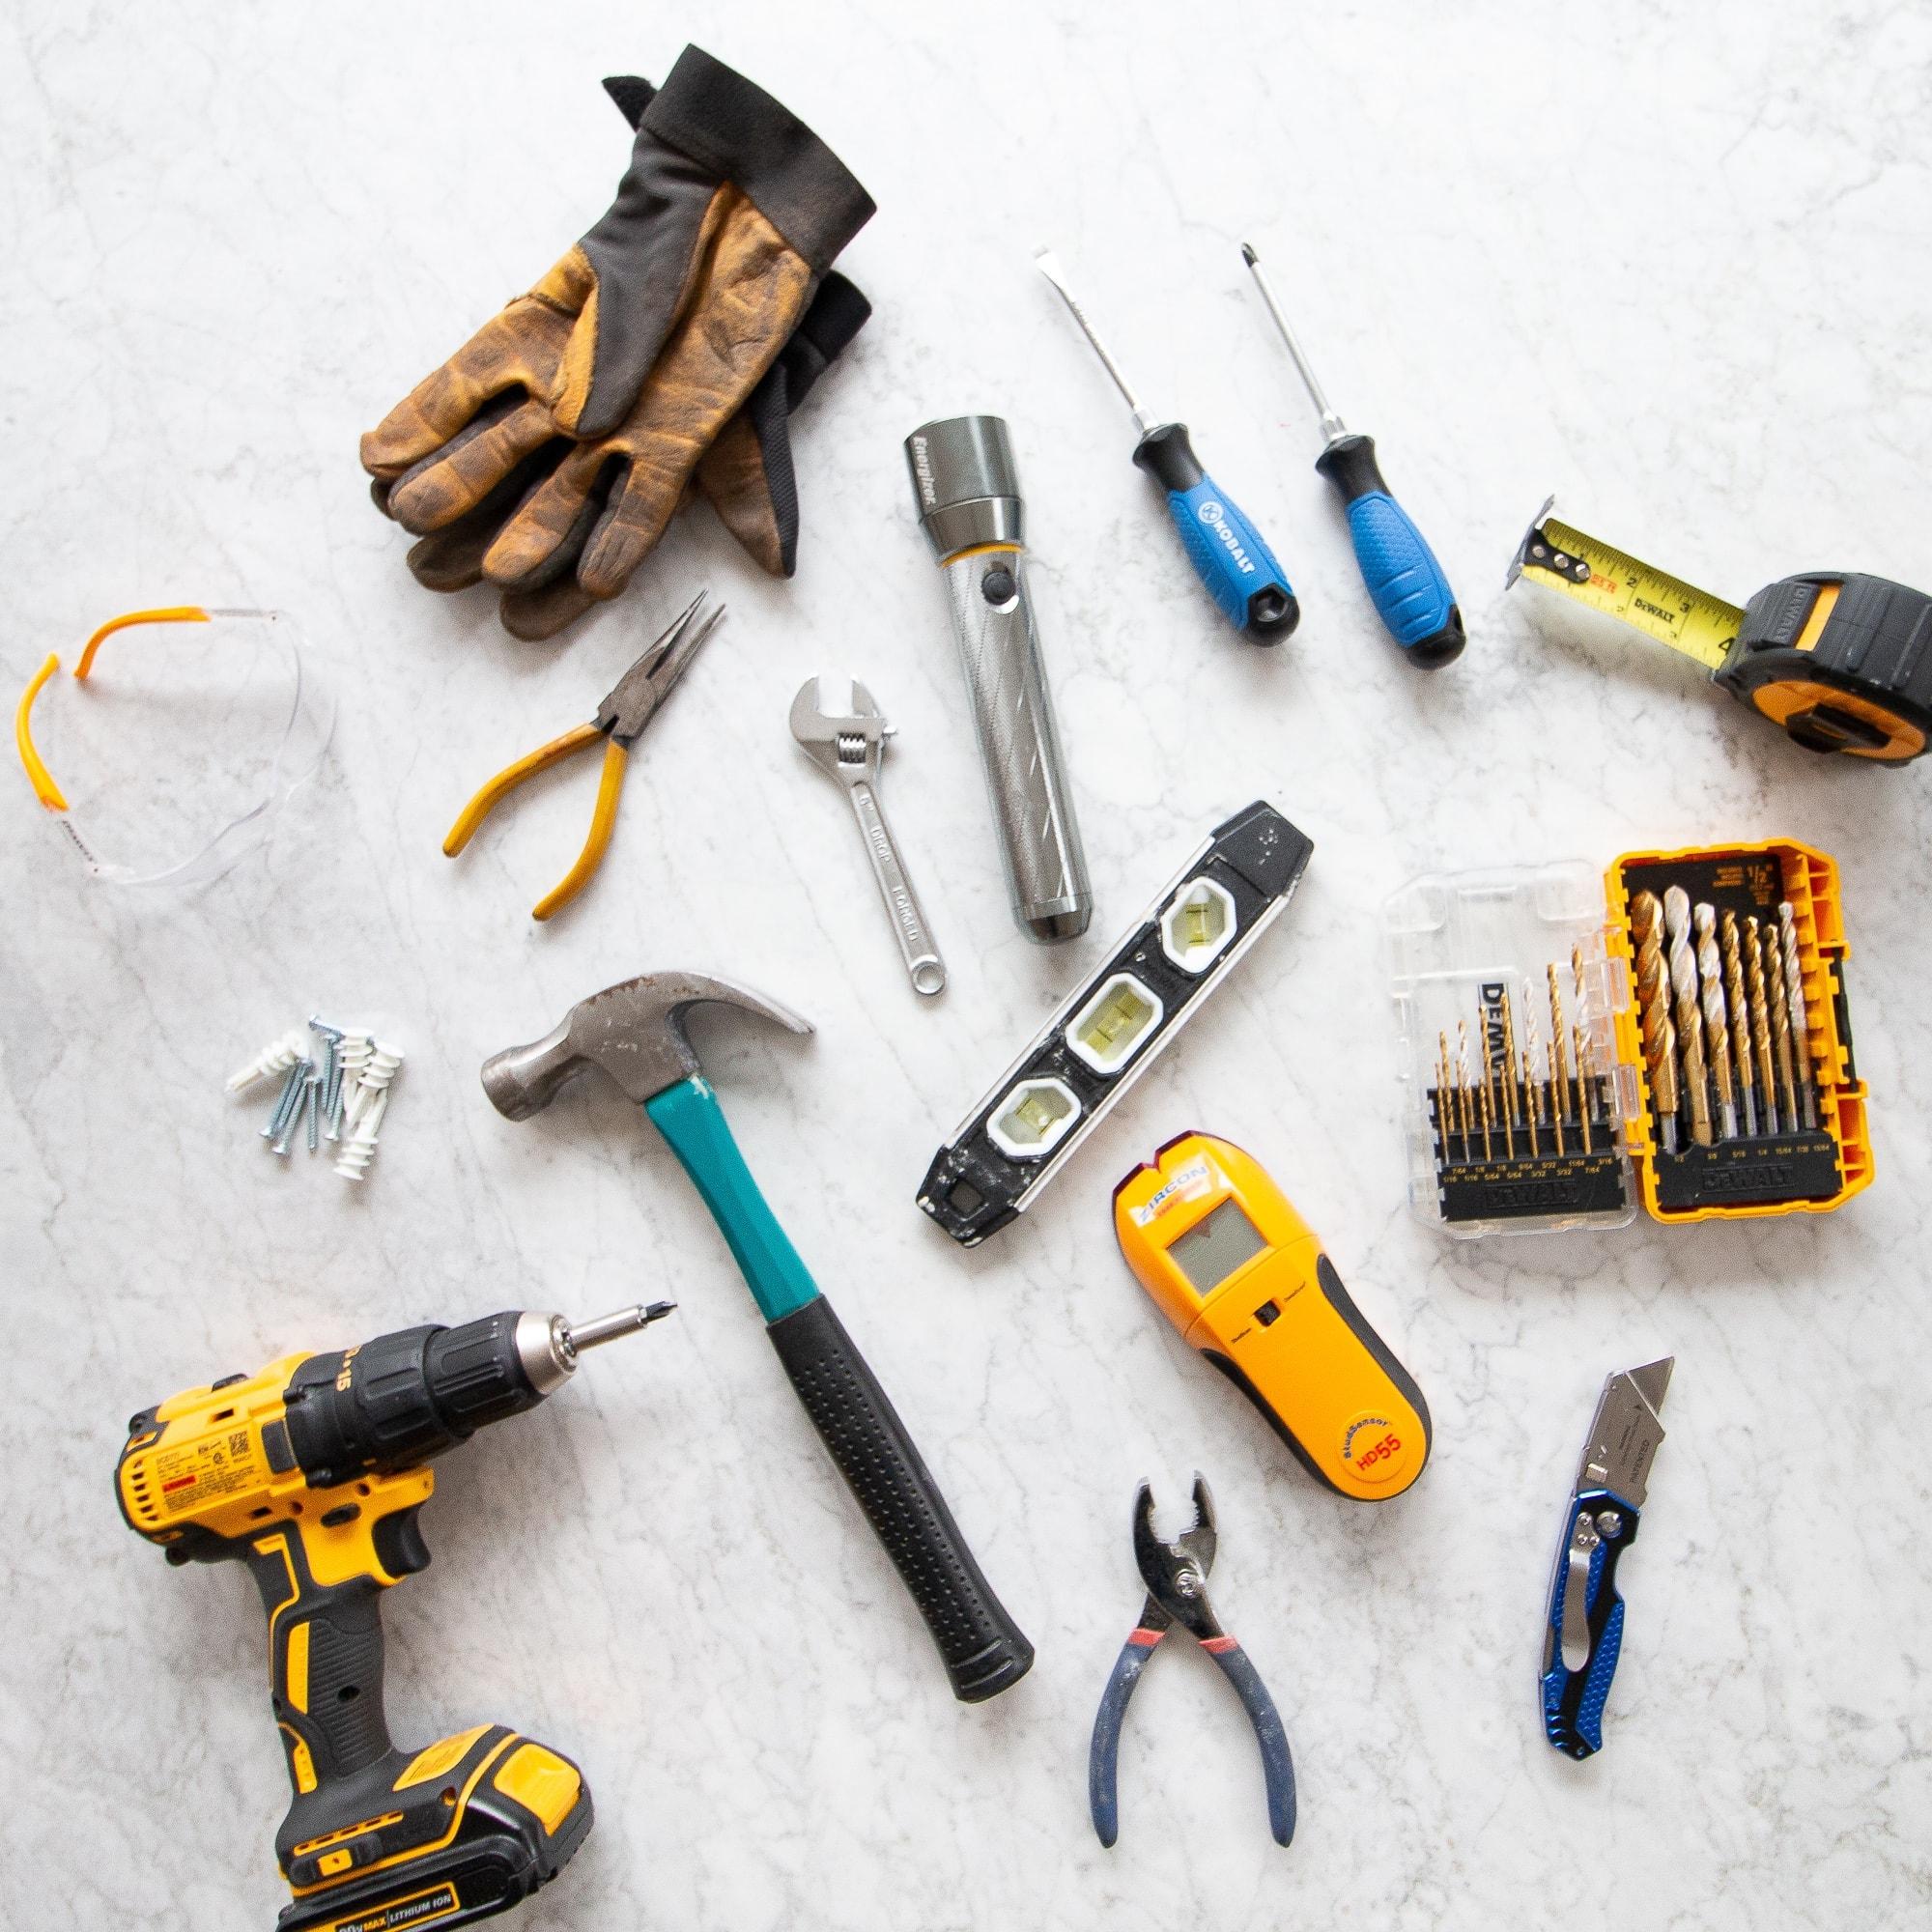 Basic tools 101